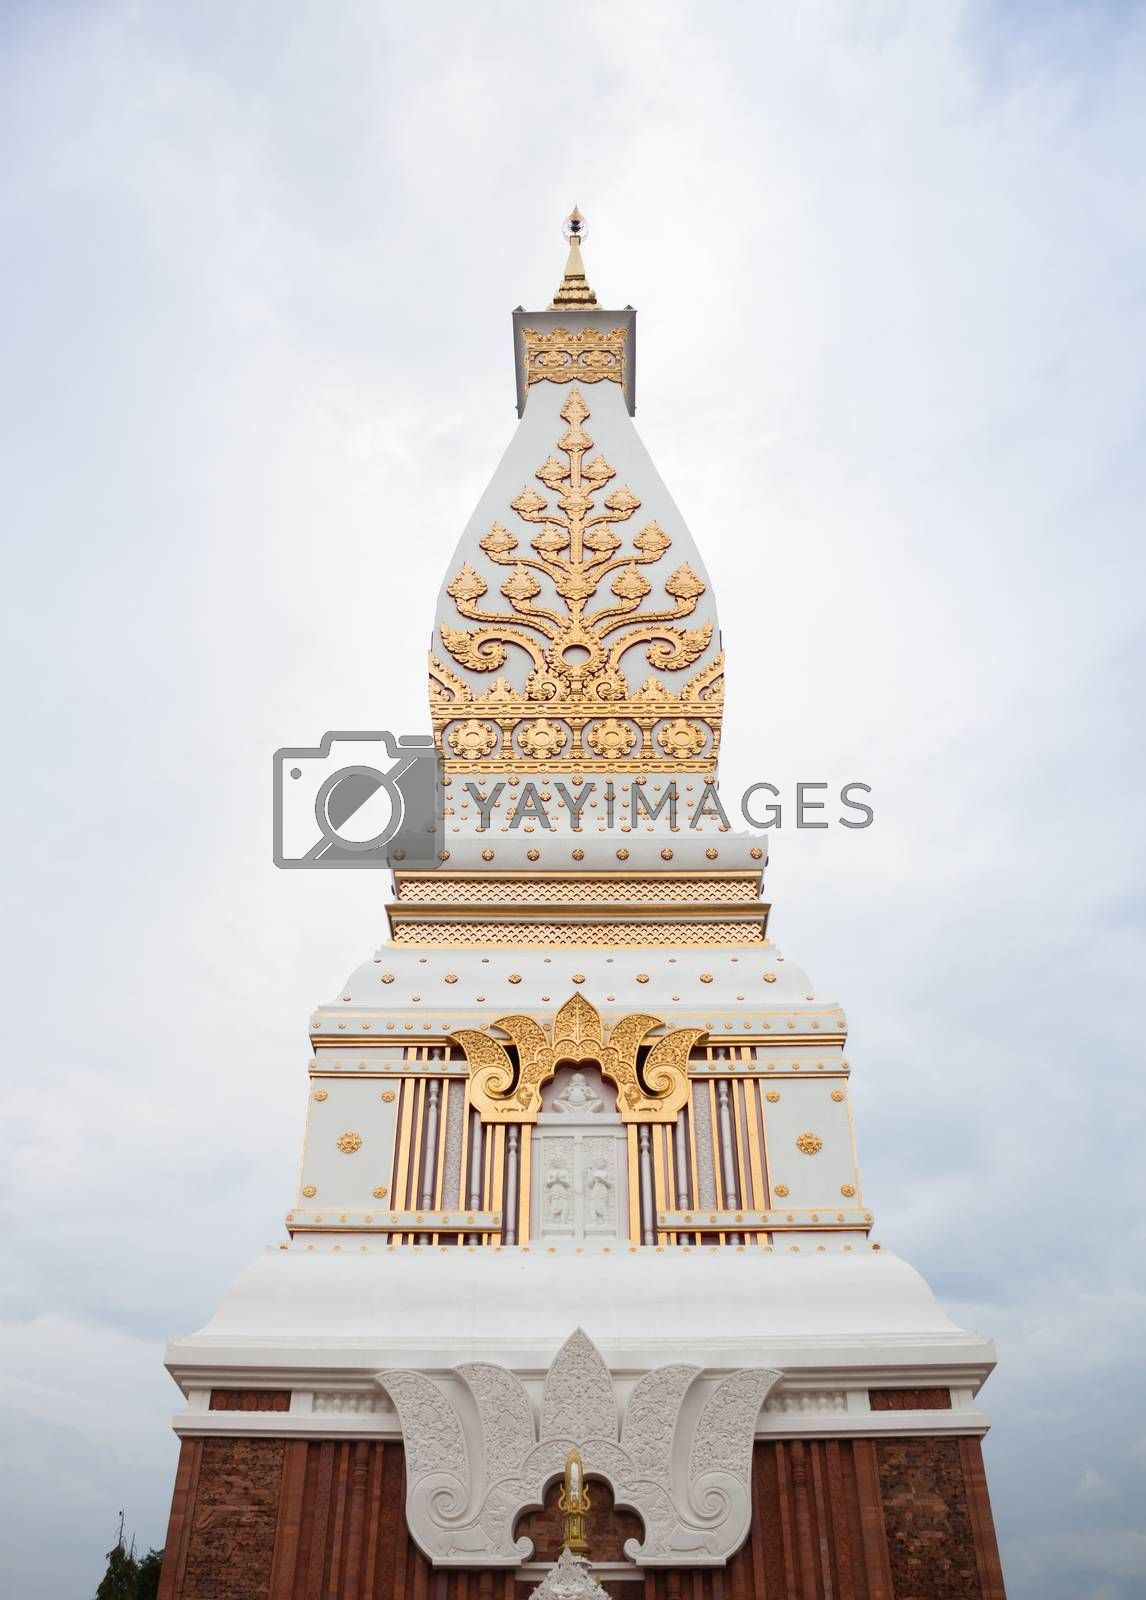 Phra That Phanom pagoda in Wat Phra That Phanom, Nakhon Phanom, Thailand, stock photo